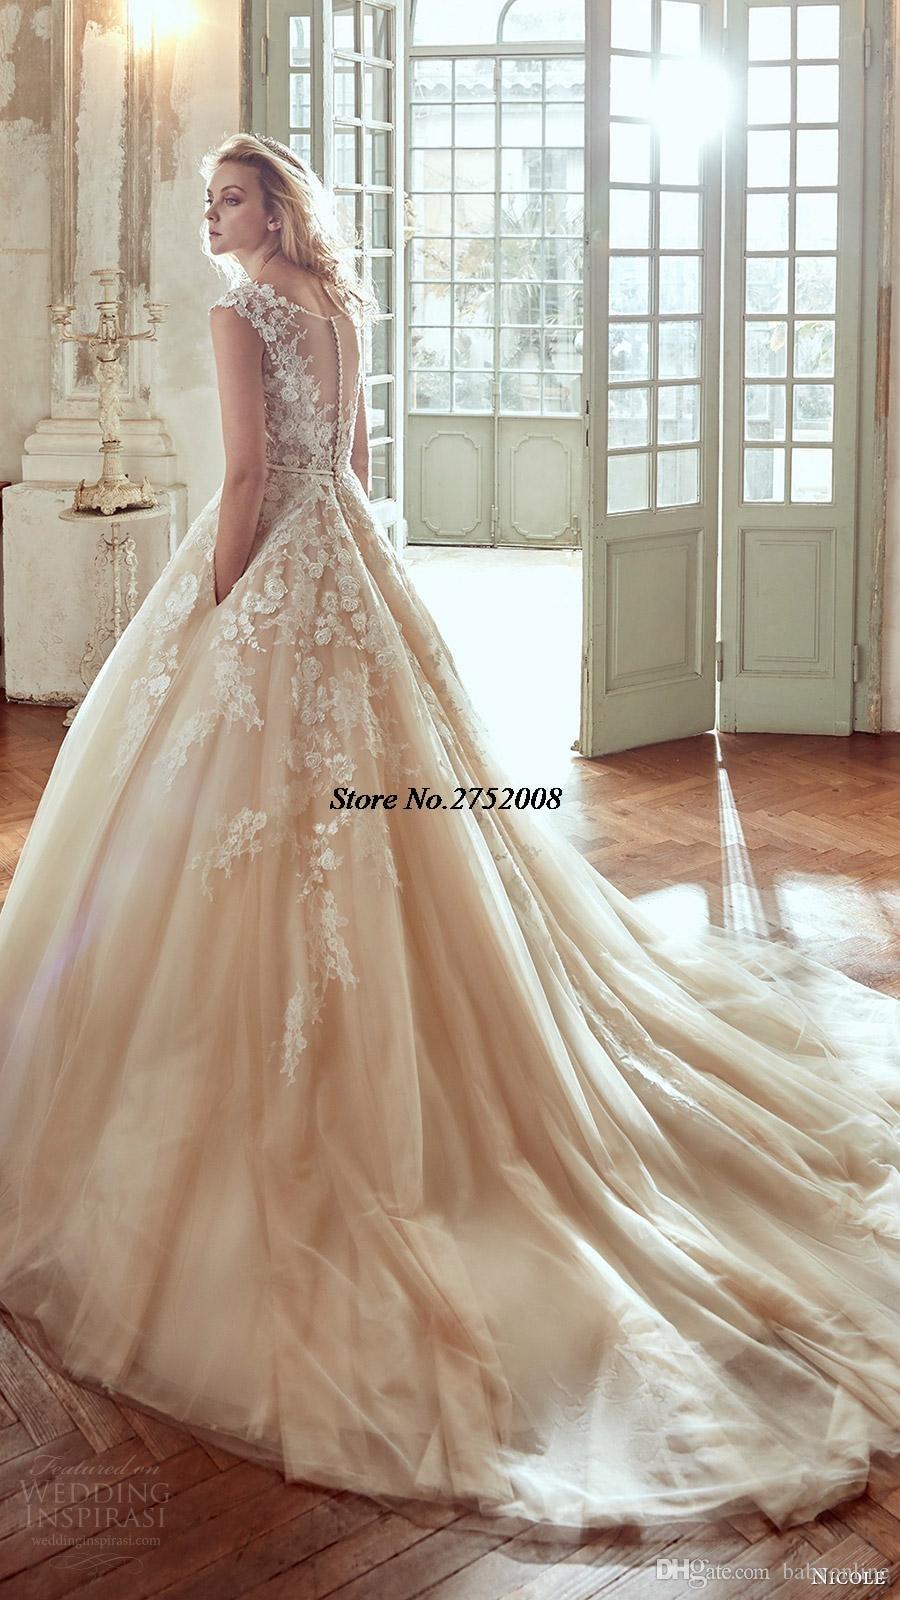 4a6edf72656b 2017 Blush Vestios De Novia 3D-Floral Ball Gown Wedding Dresses Lace Button  Back Luxury Arabic Bridal Gowns with Pockets WB49